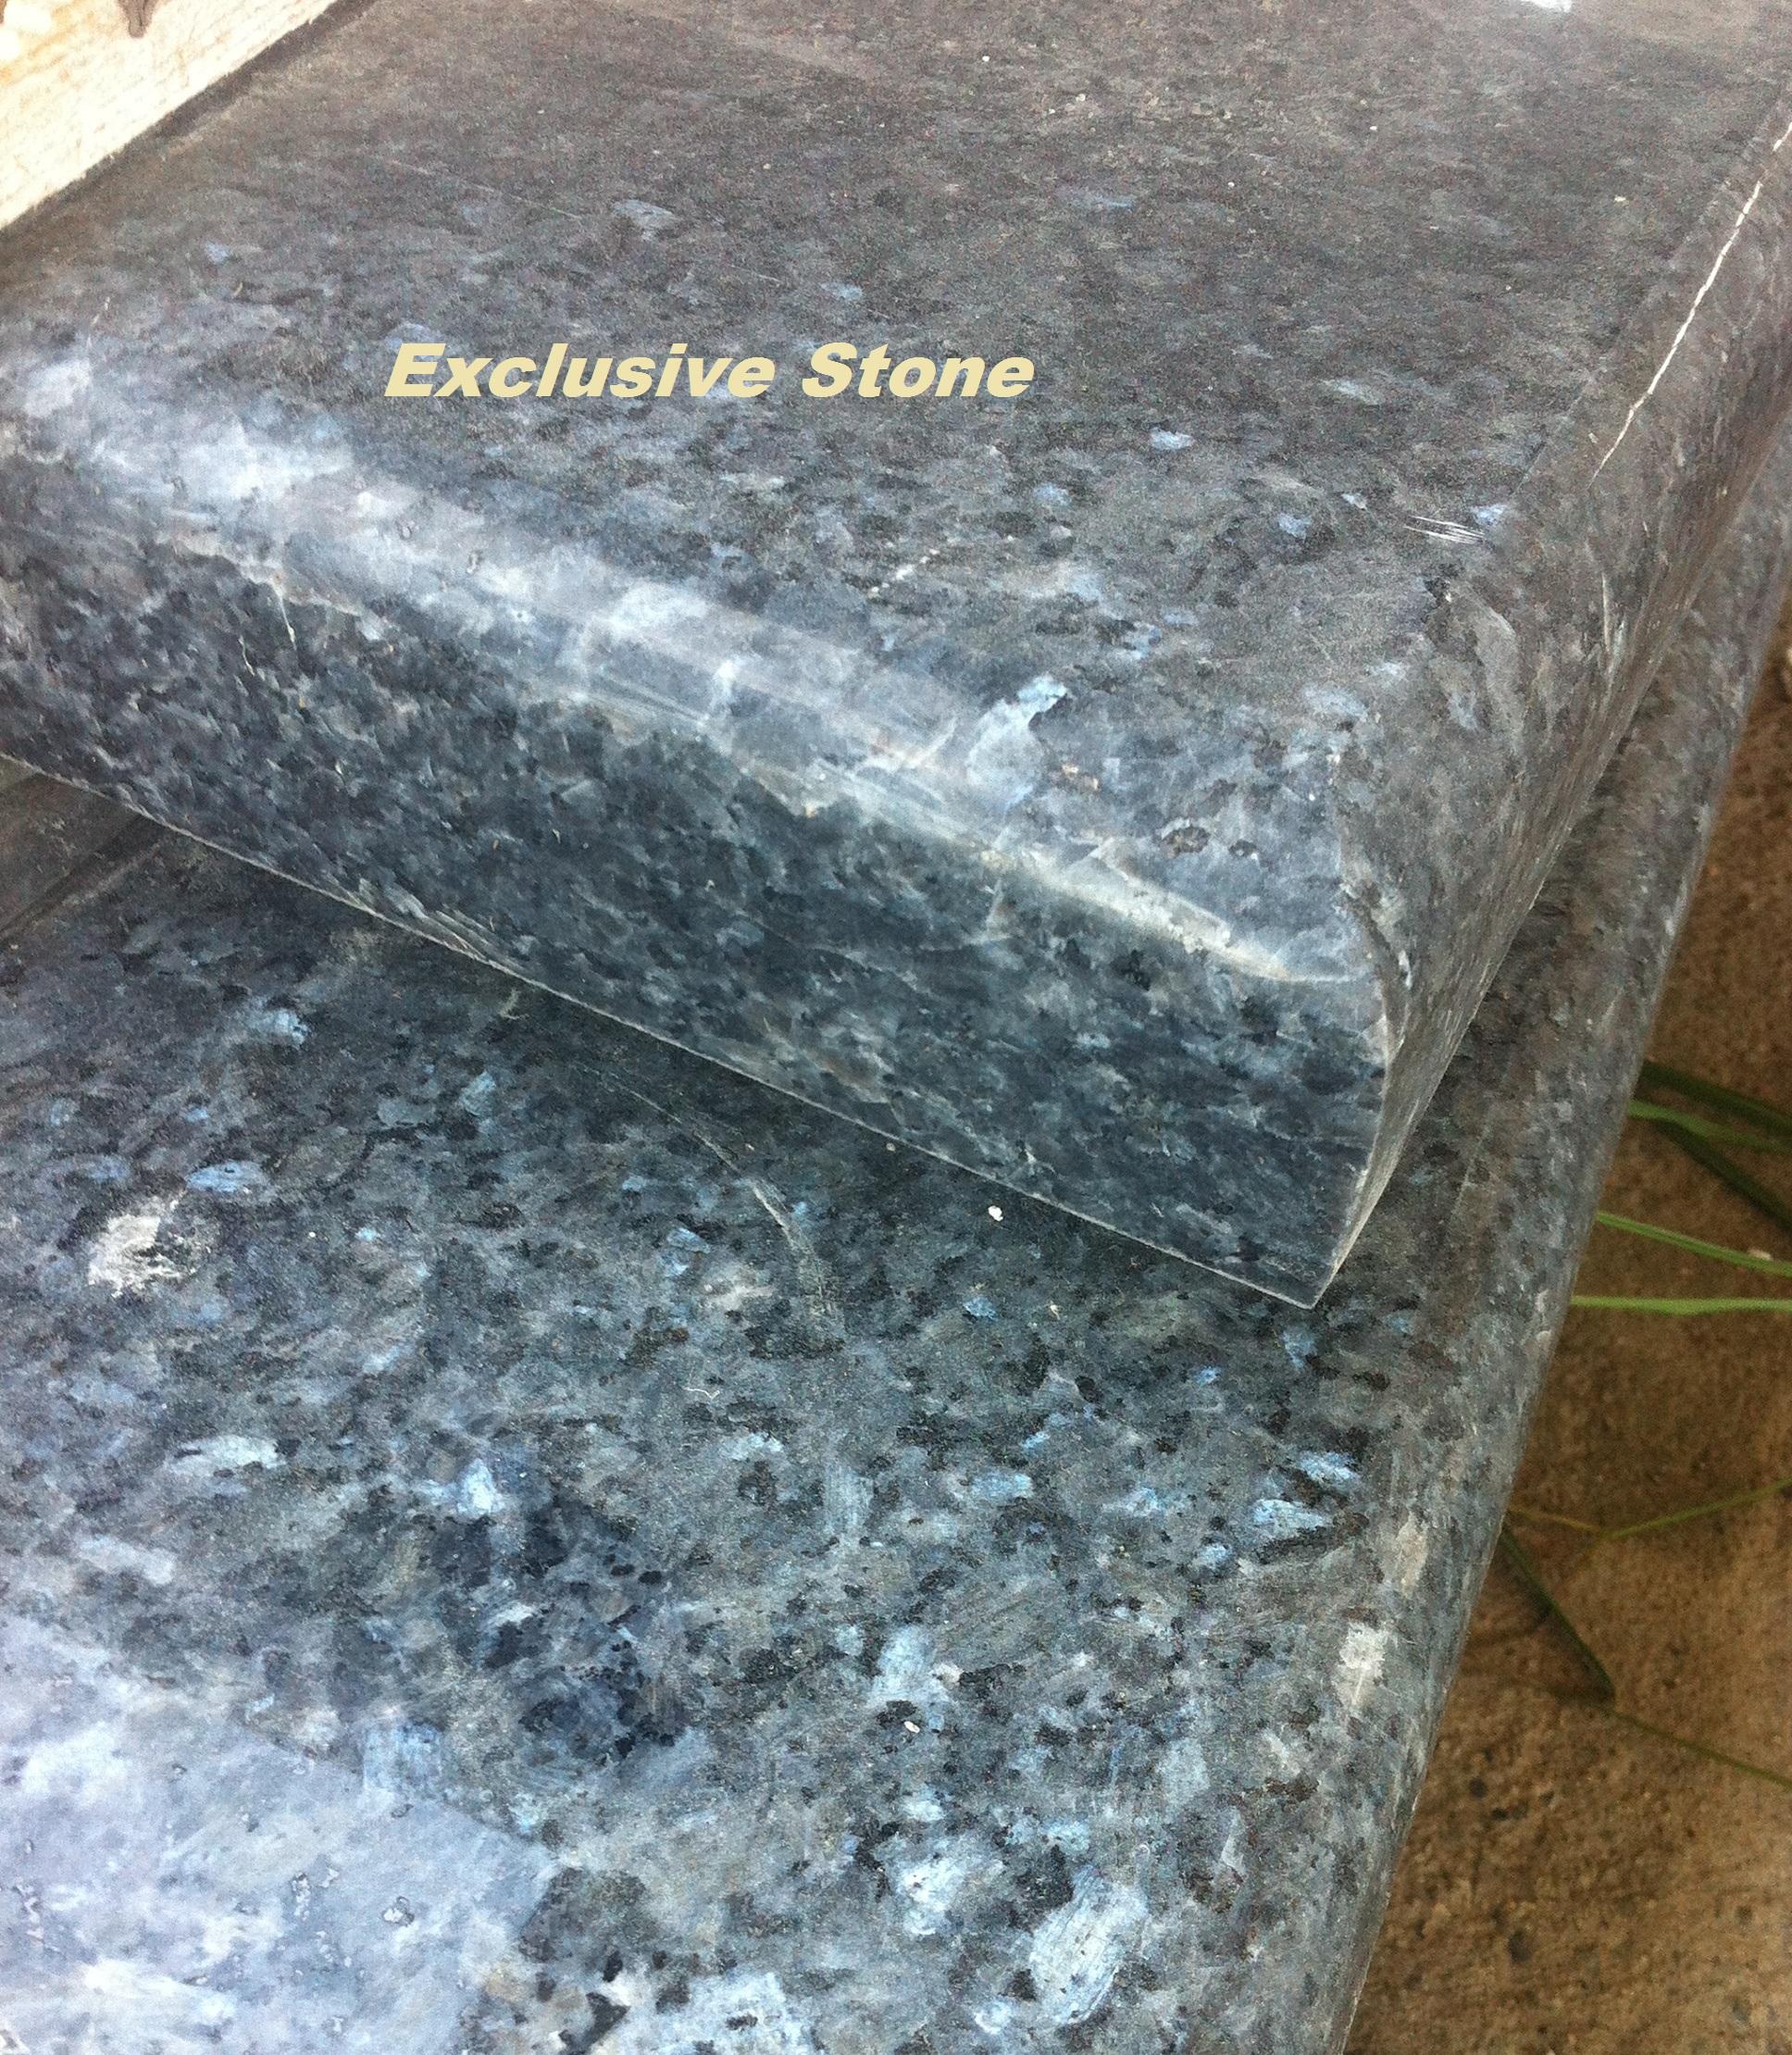 Piese /masive Granit Perla Blue cu grosimi de 2, 3, 4, 5, 6, 8 , 10  cm